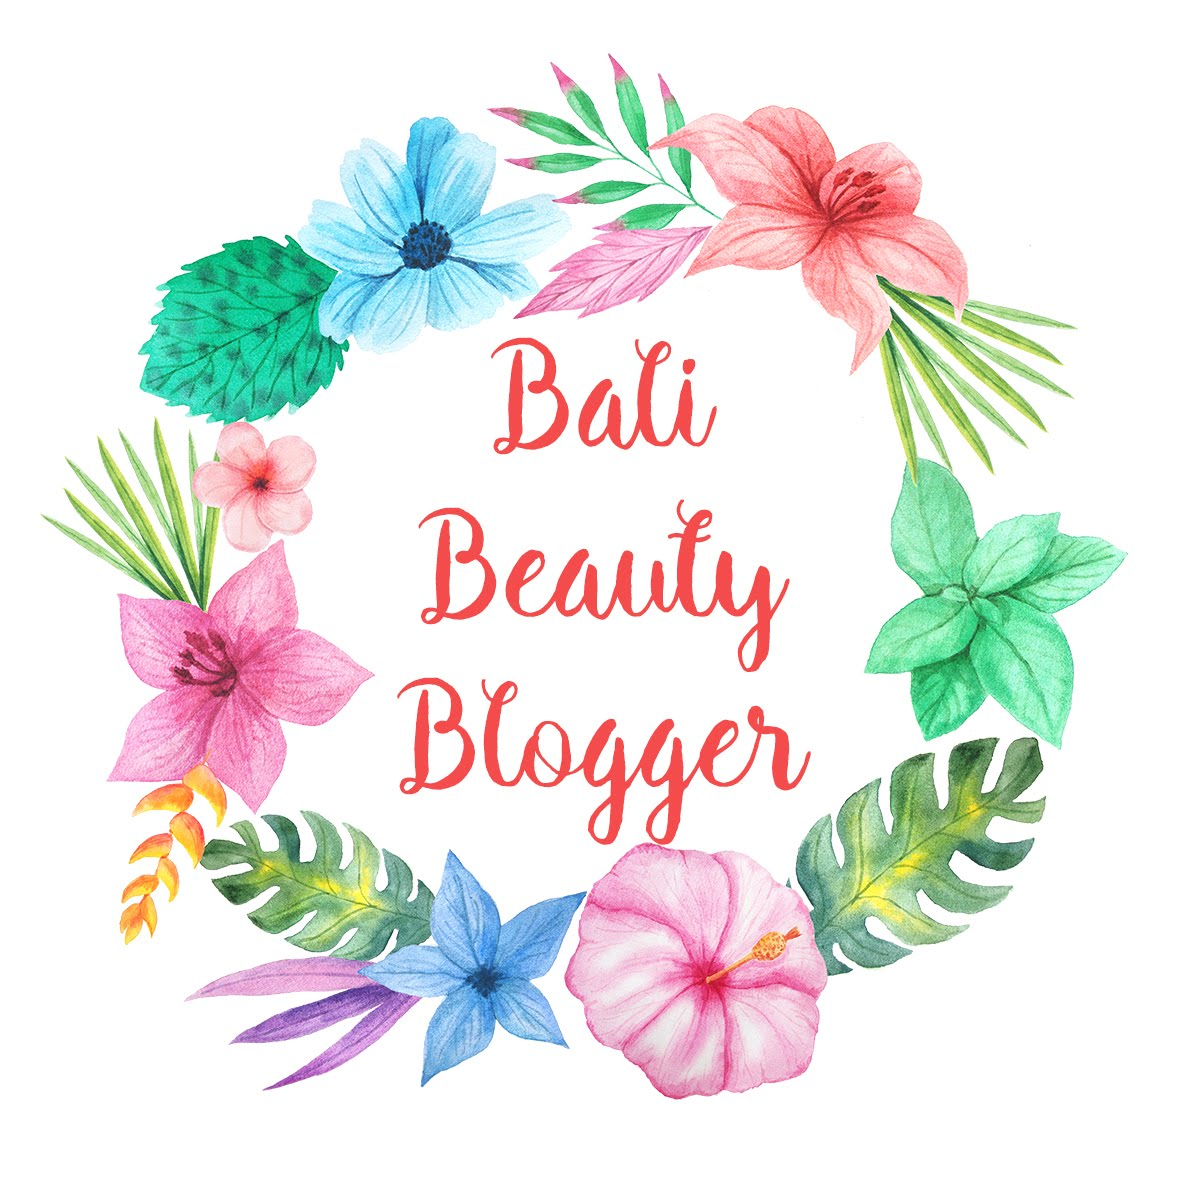 Anggota Bali Beauty Blogger